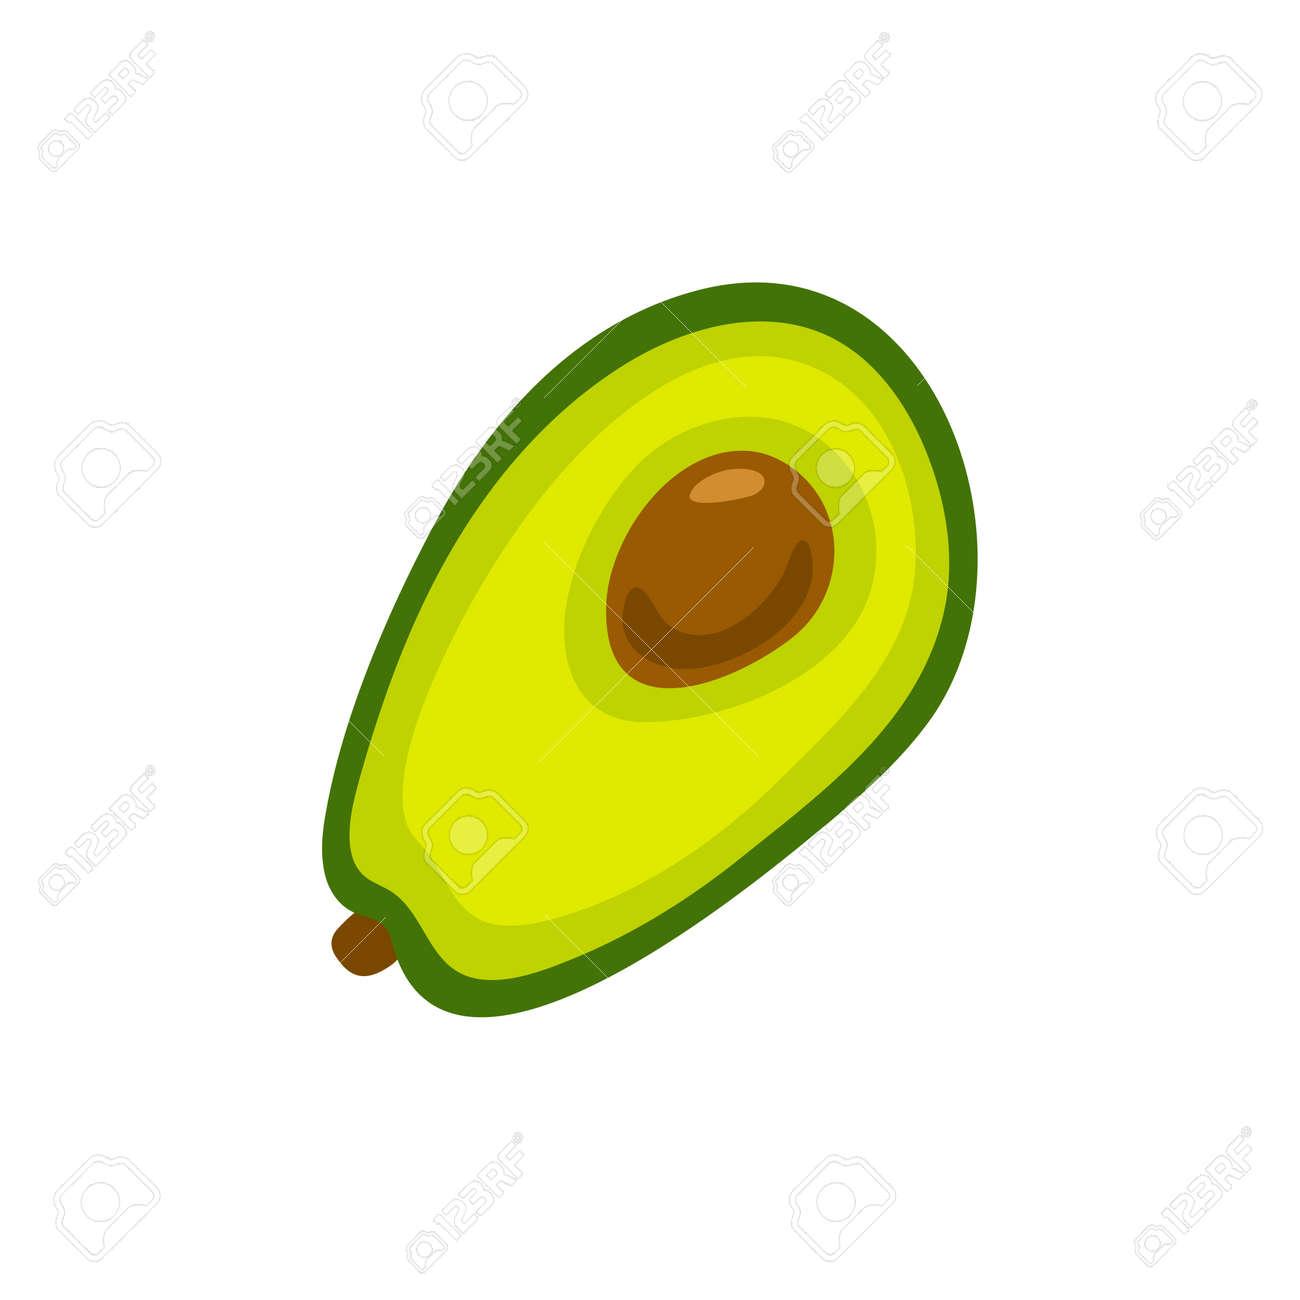 Avocado icon. Flat illustration of avocado vector icon isolated on white background. - 169771950